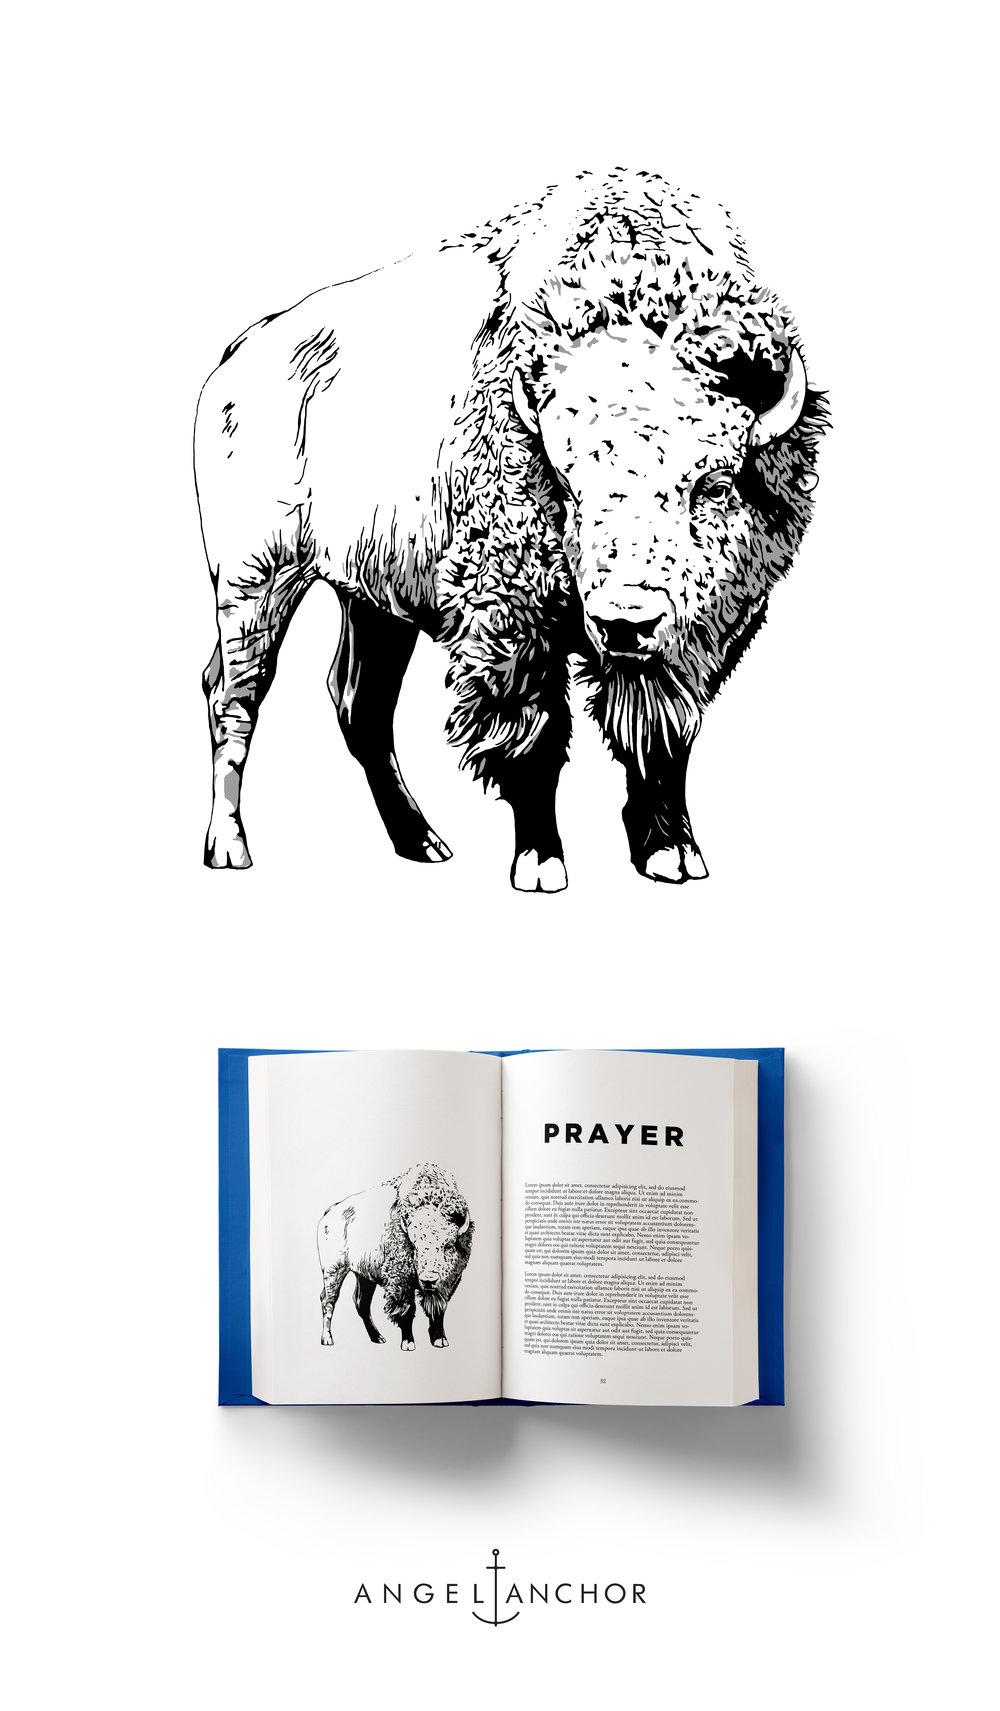 #2 -PRAYER